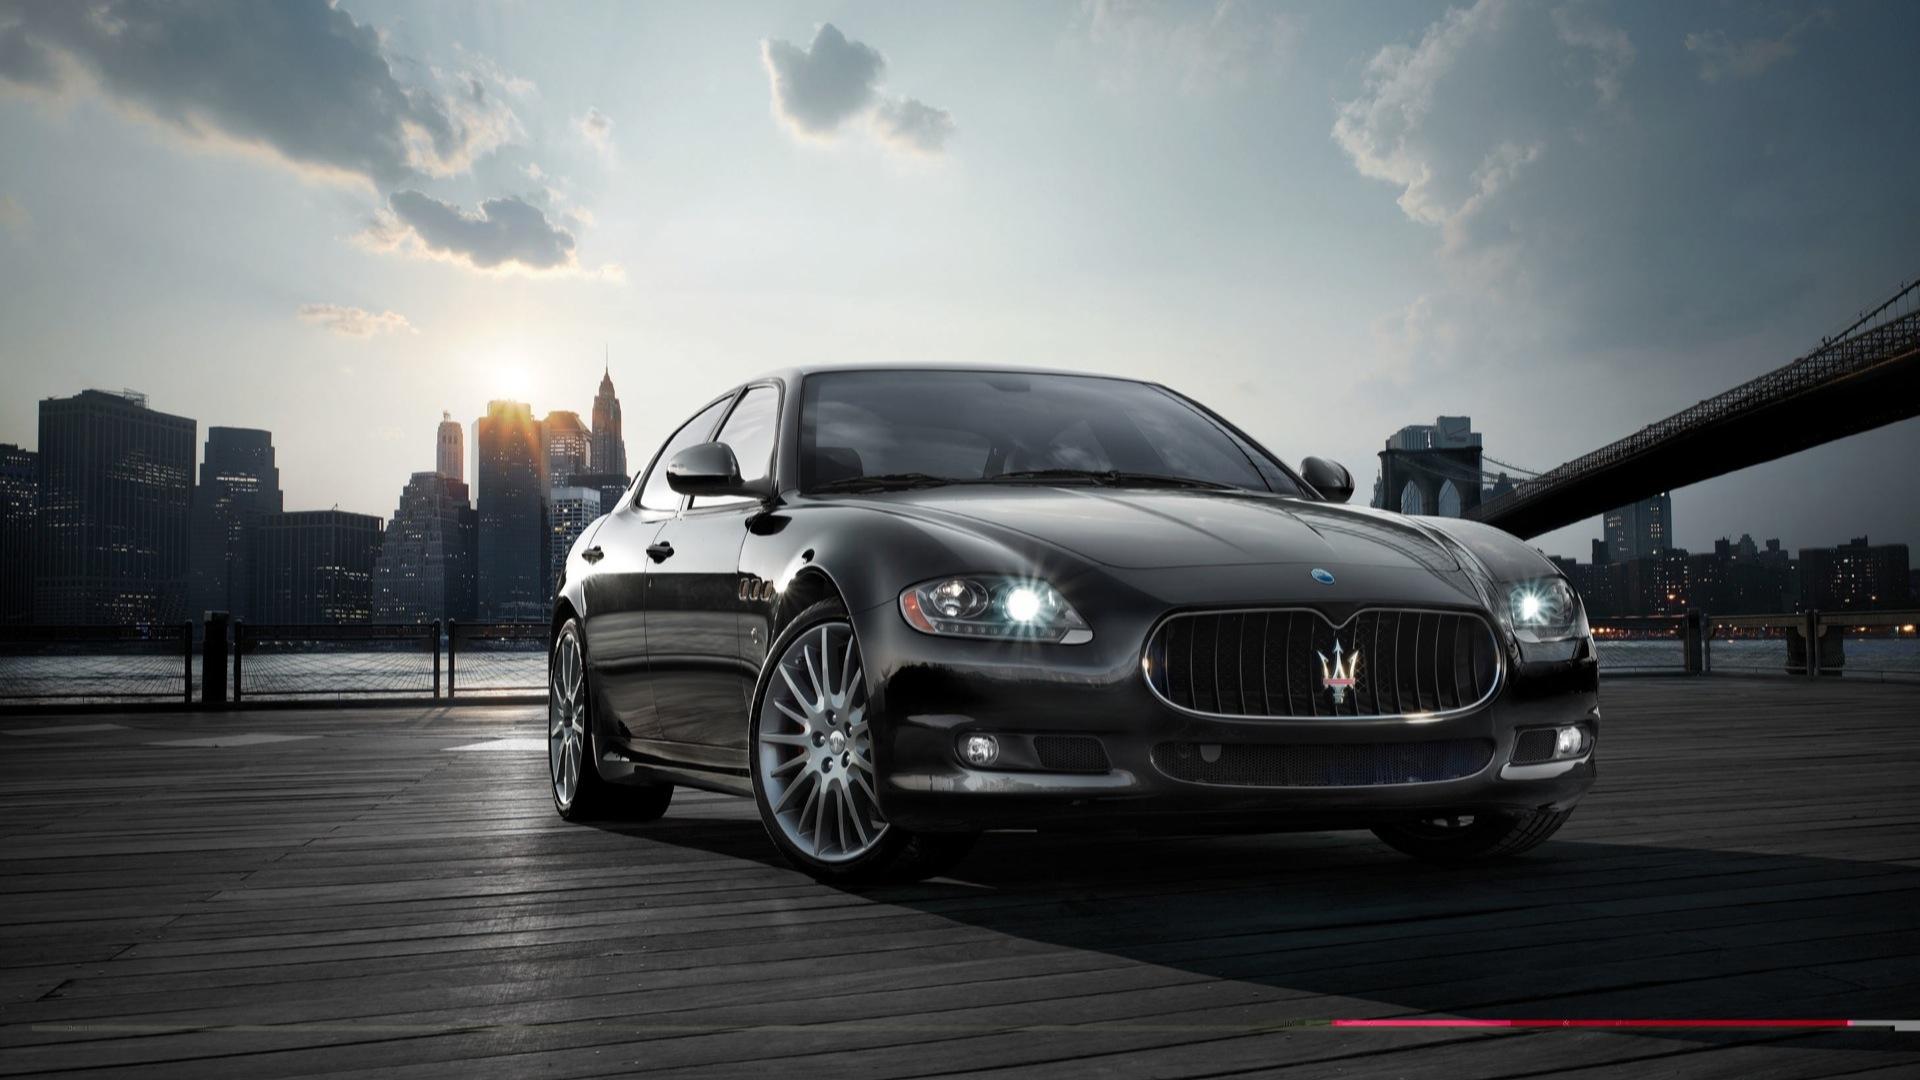 Maserati-quattroporte-2013-S-GTS Exterior